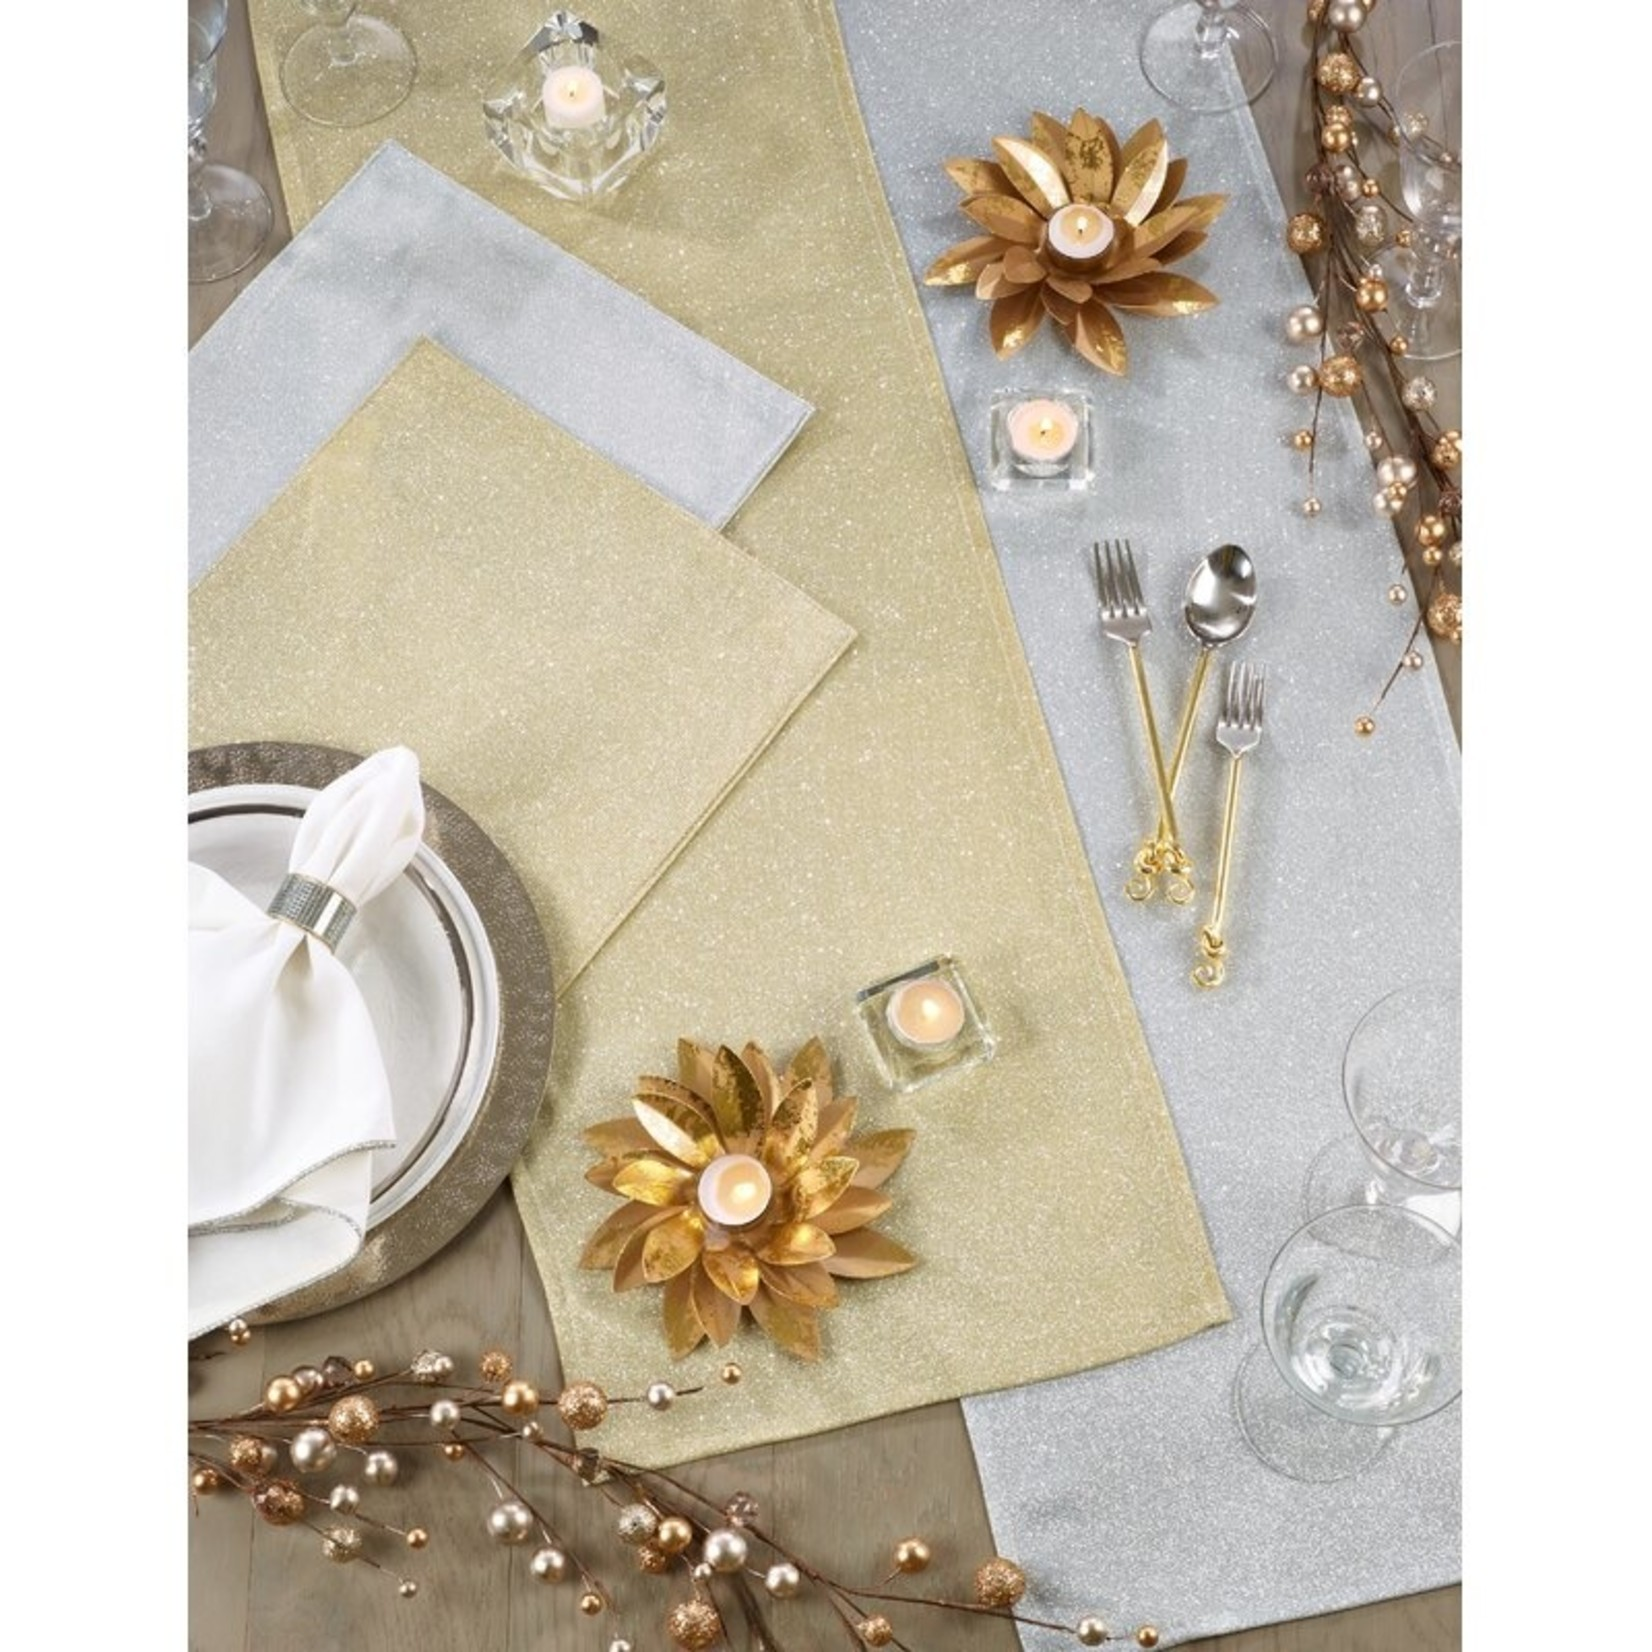 *Melgar Shimmering Table Runner - Gold